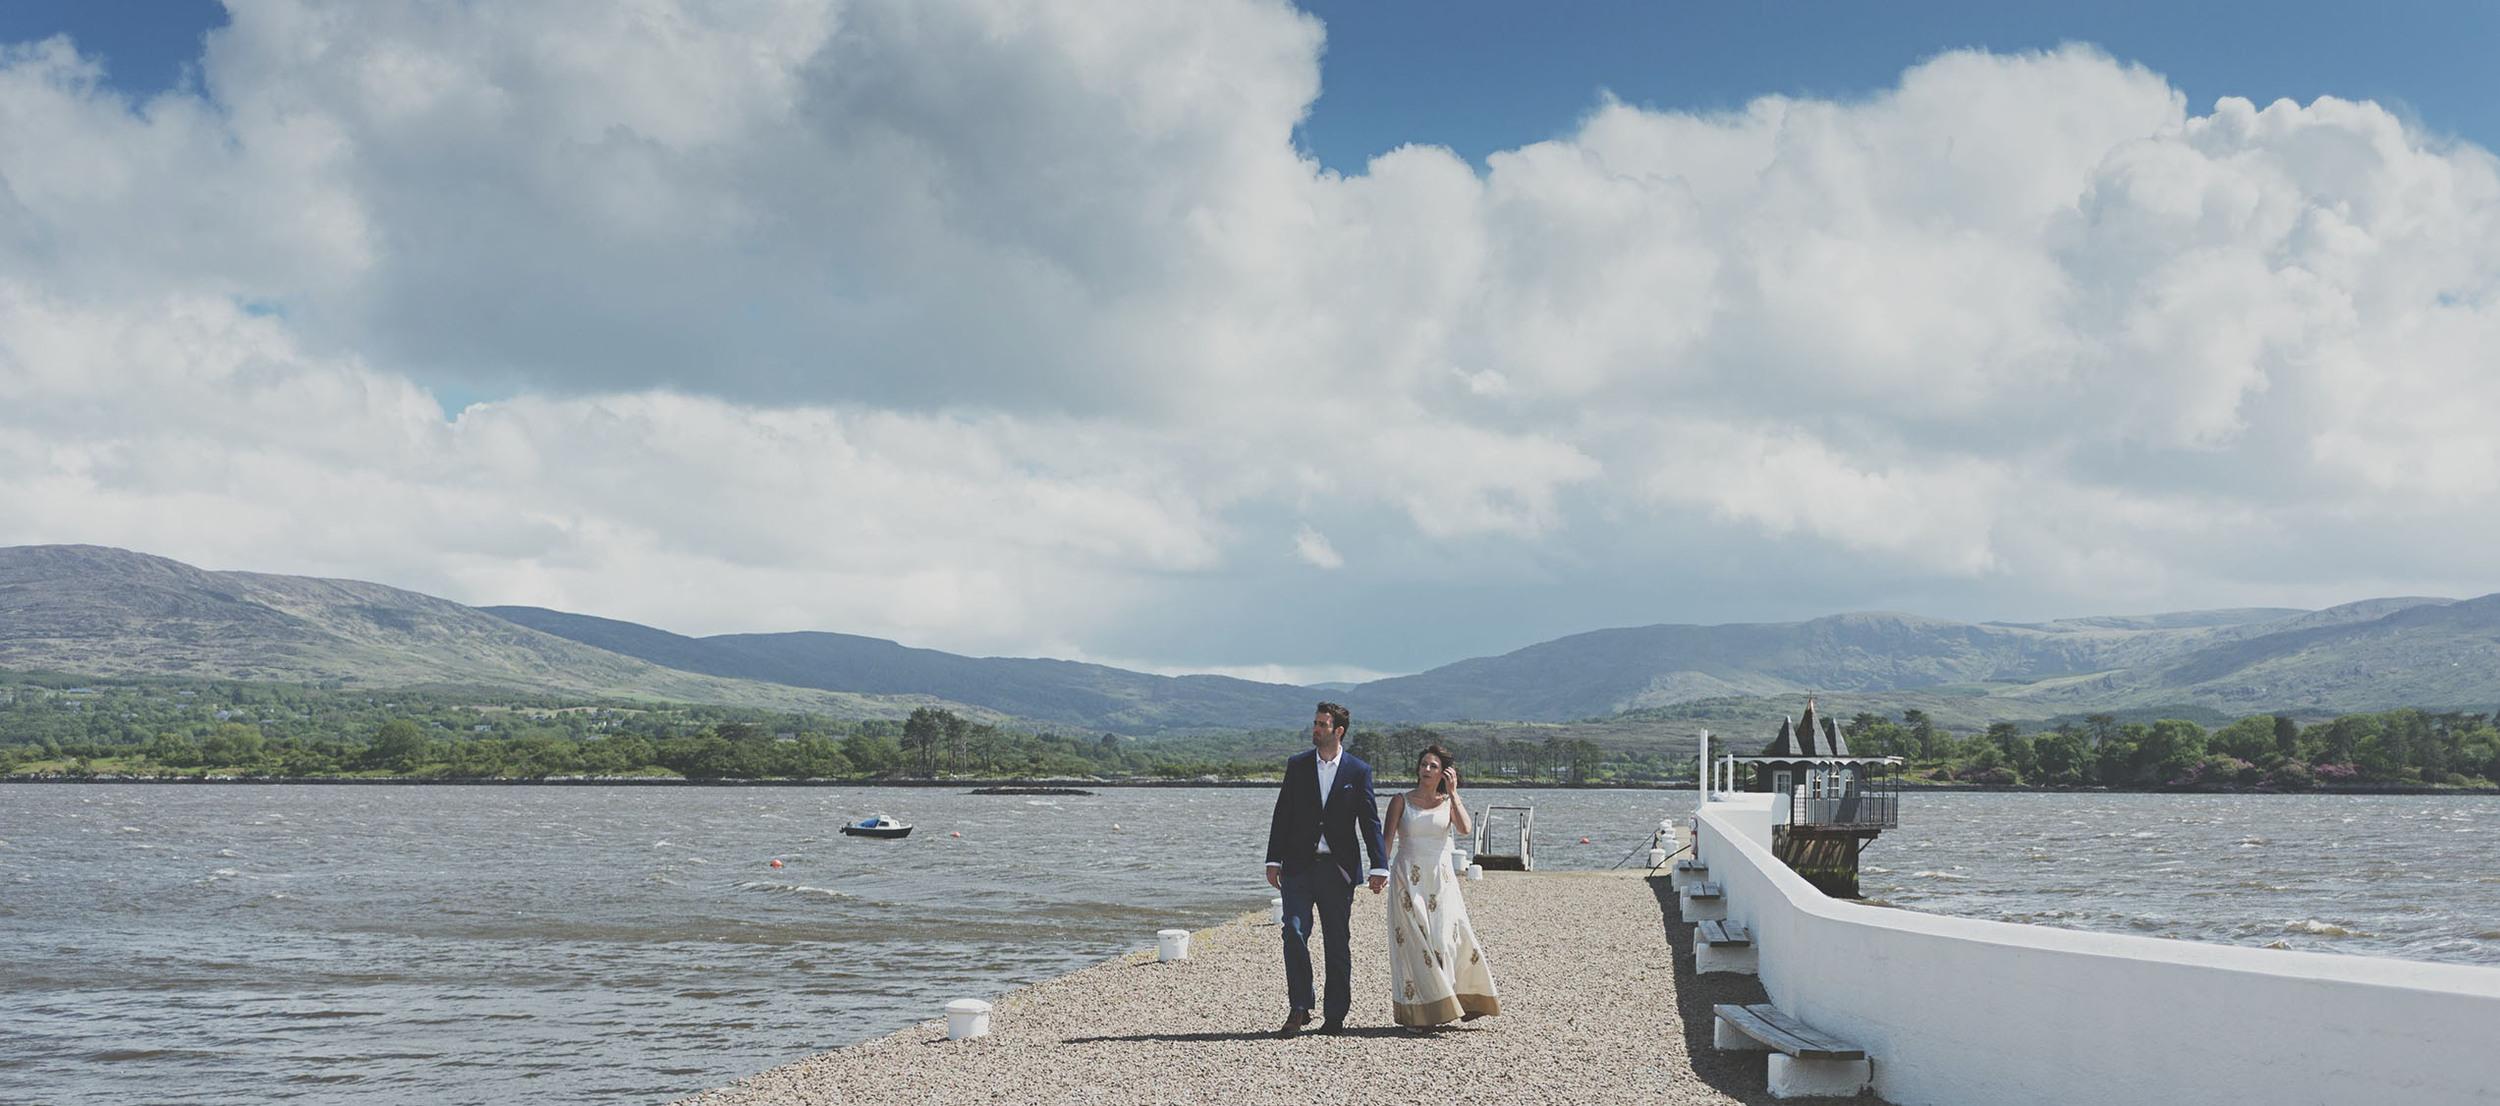 Catherine & David's Dromquinna wedding 022.jpg